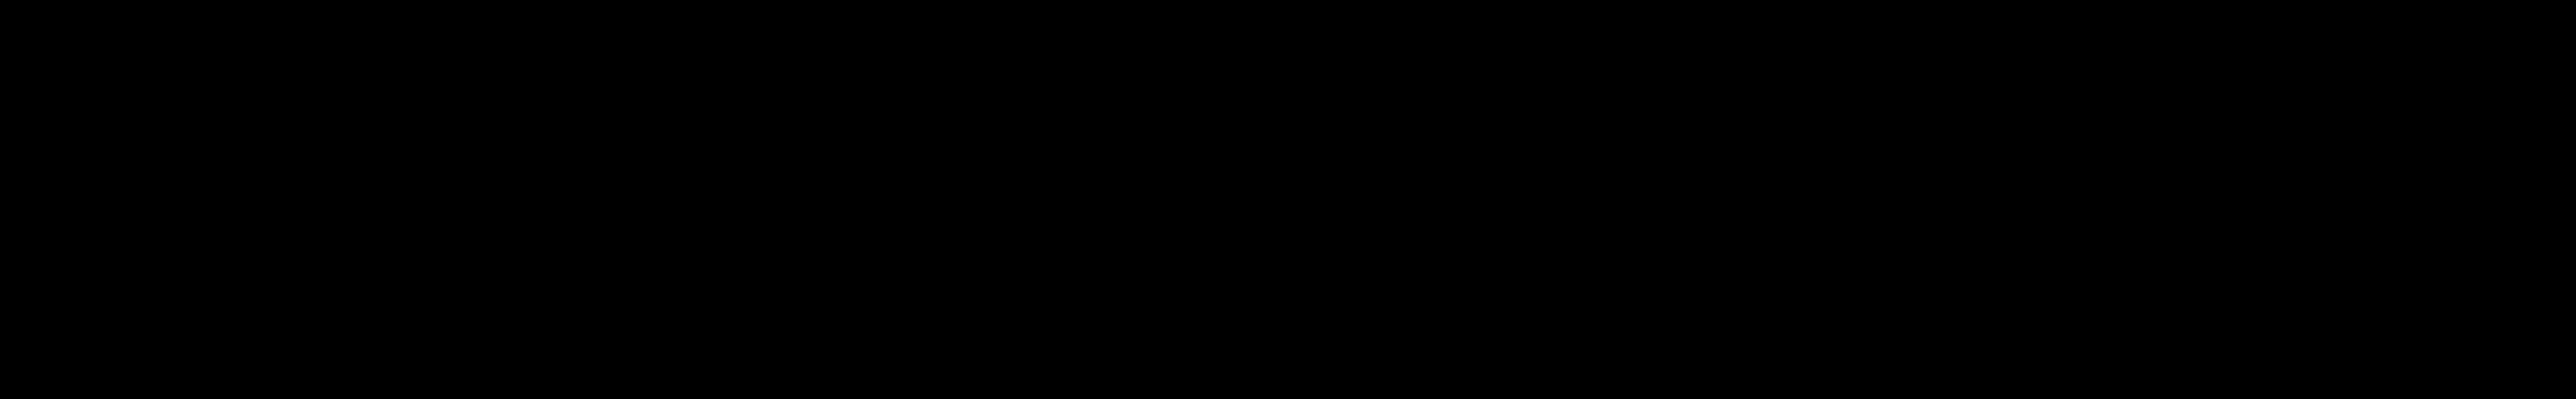 AeroPoints ground control points logo